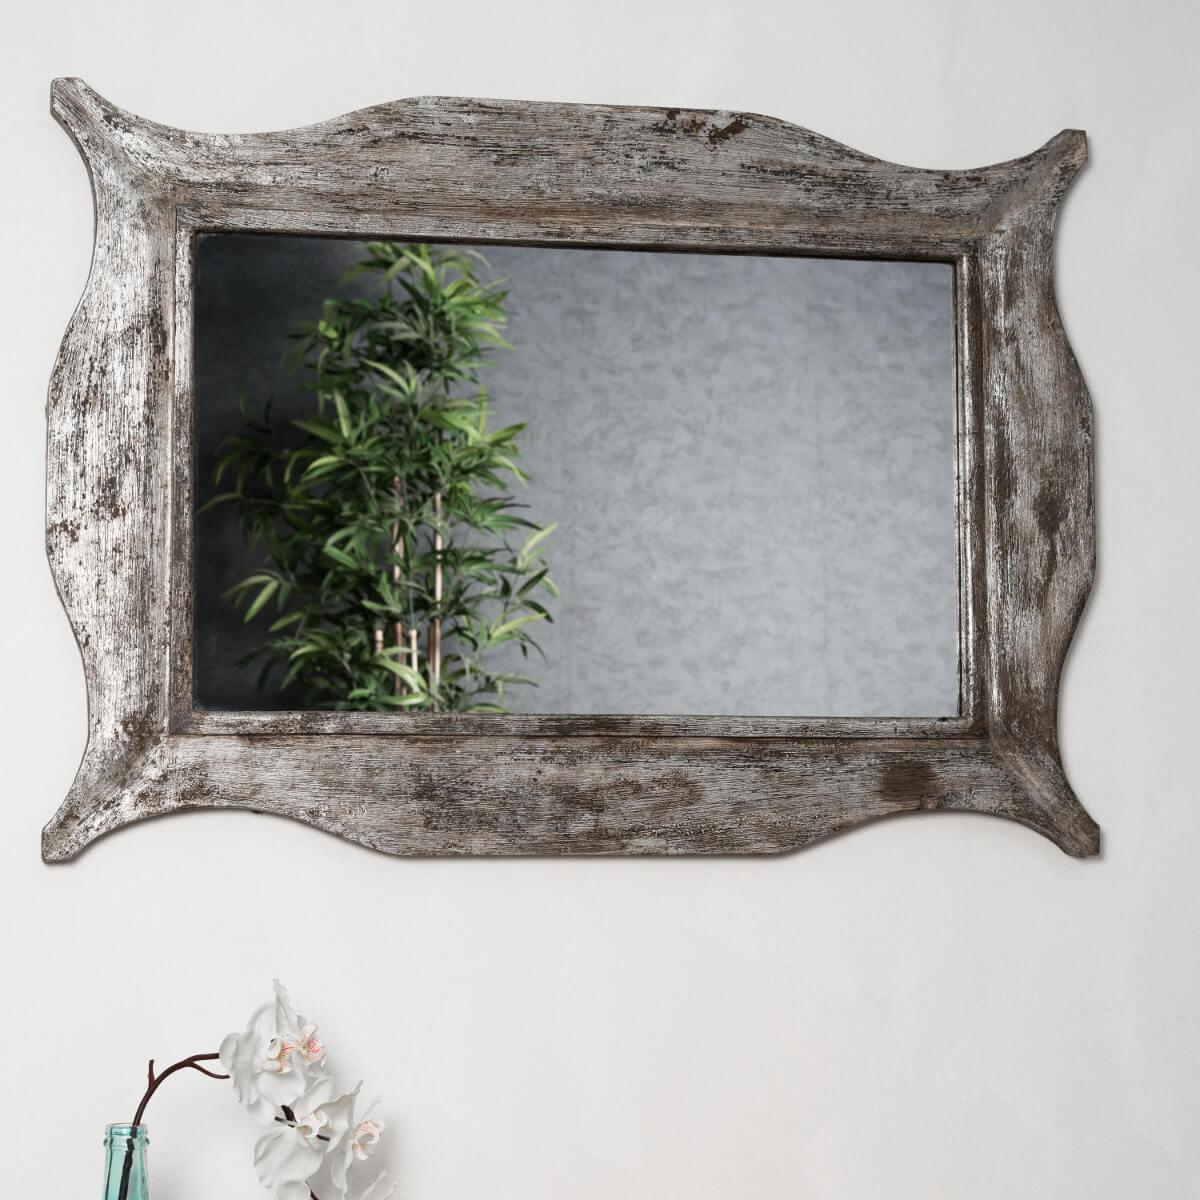 Miroir moderne en bois patin bronze 70 x 100cm for Miroir bois 50 x 70